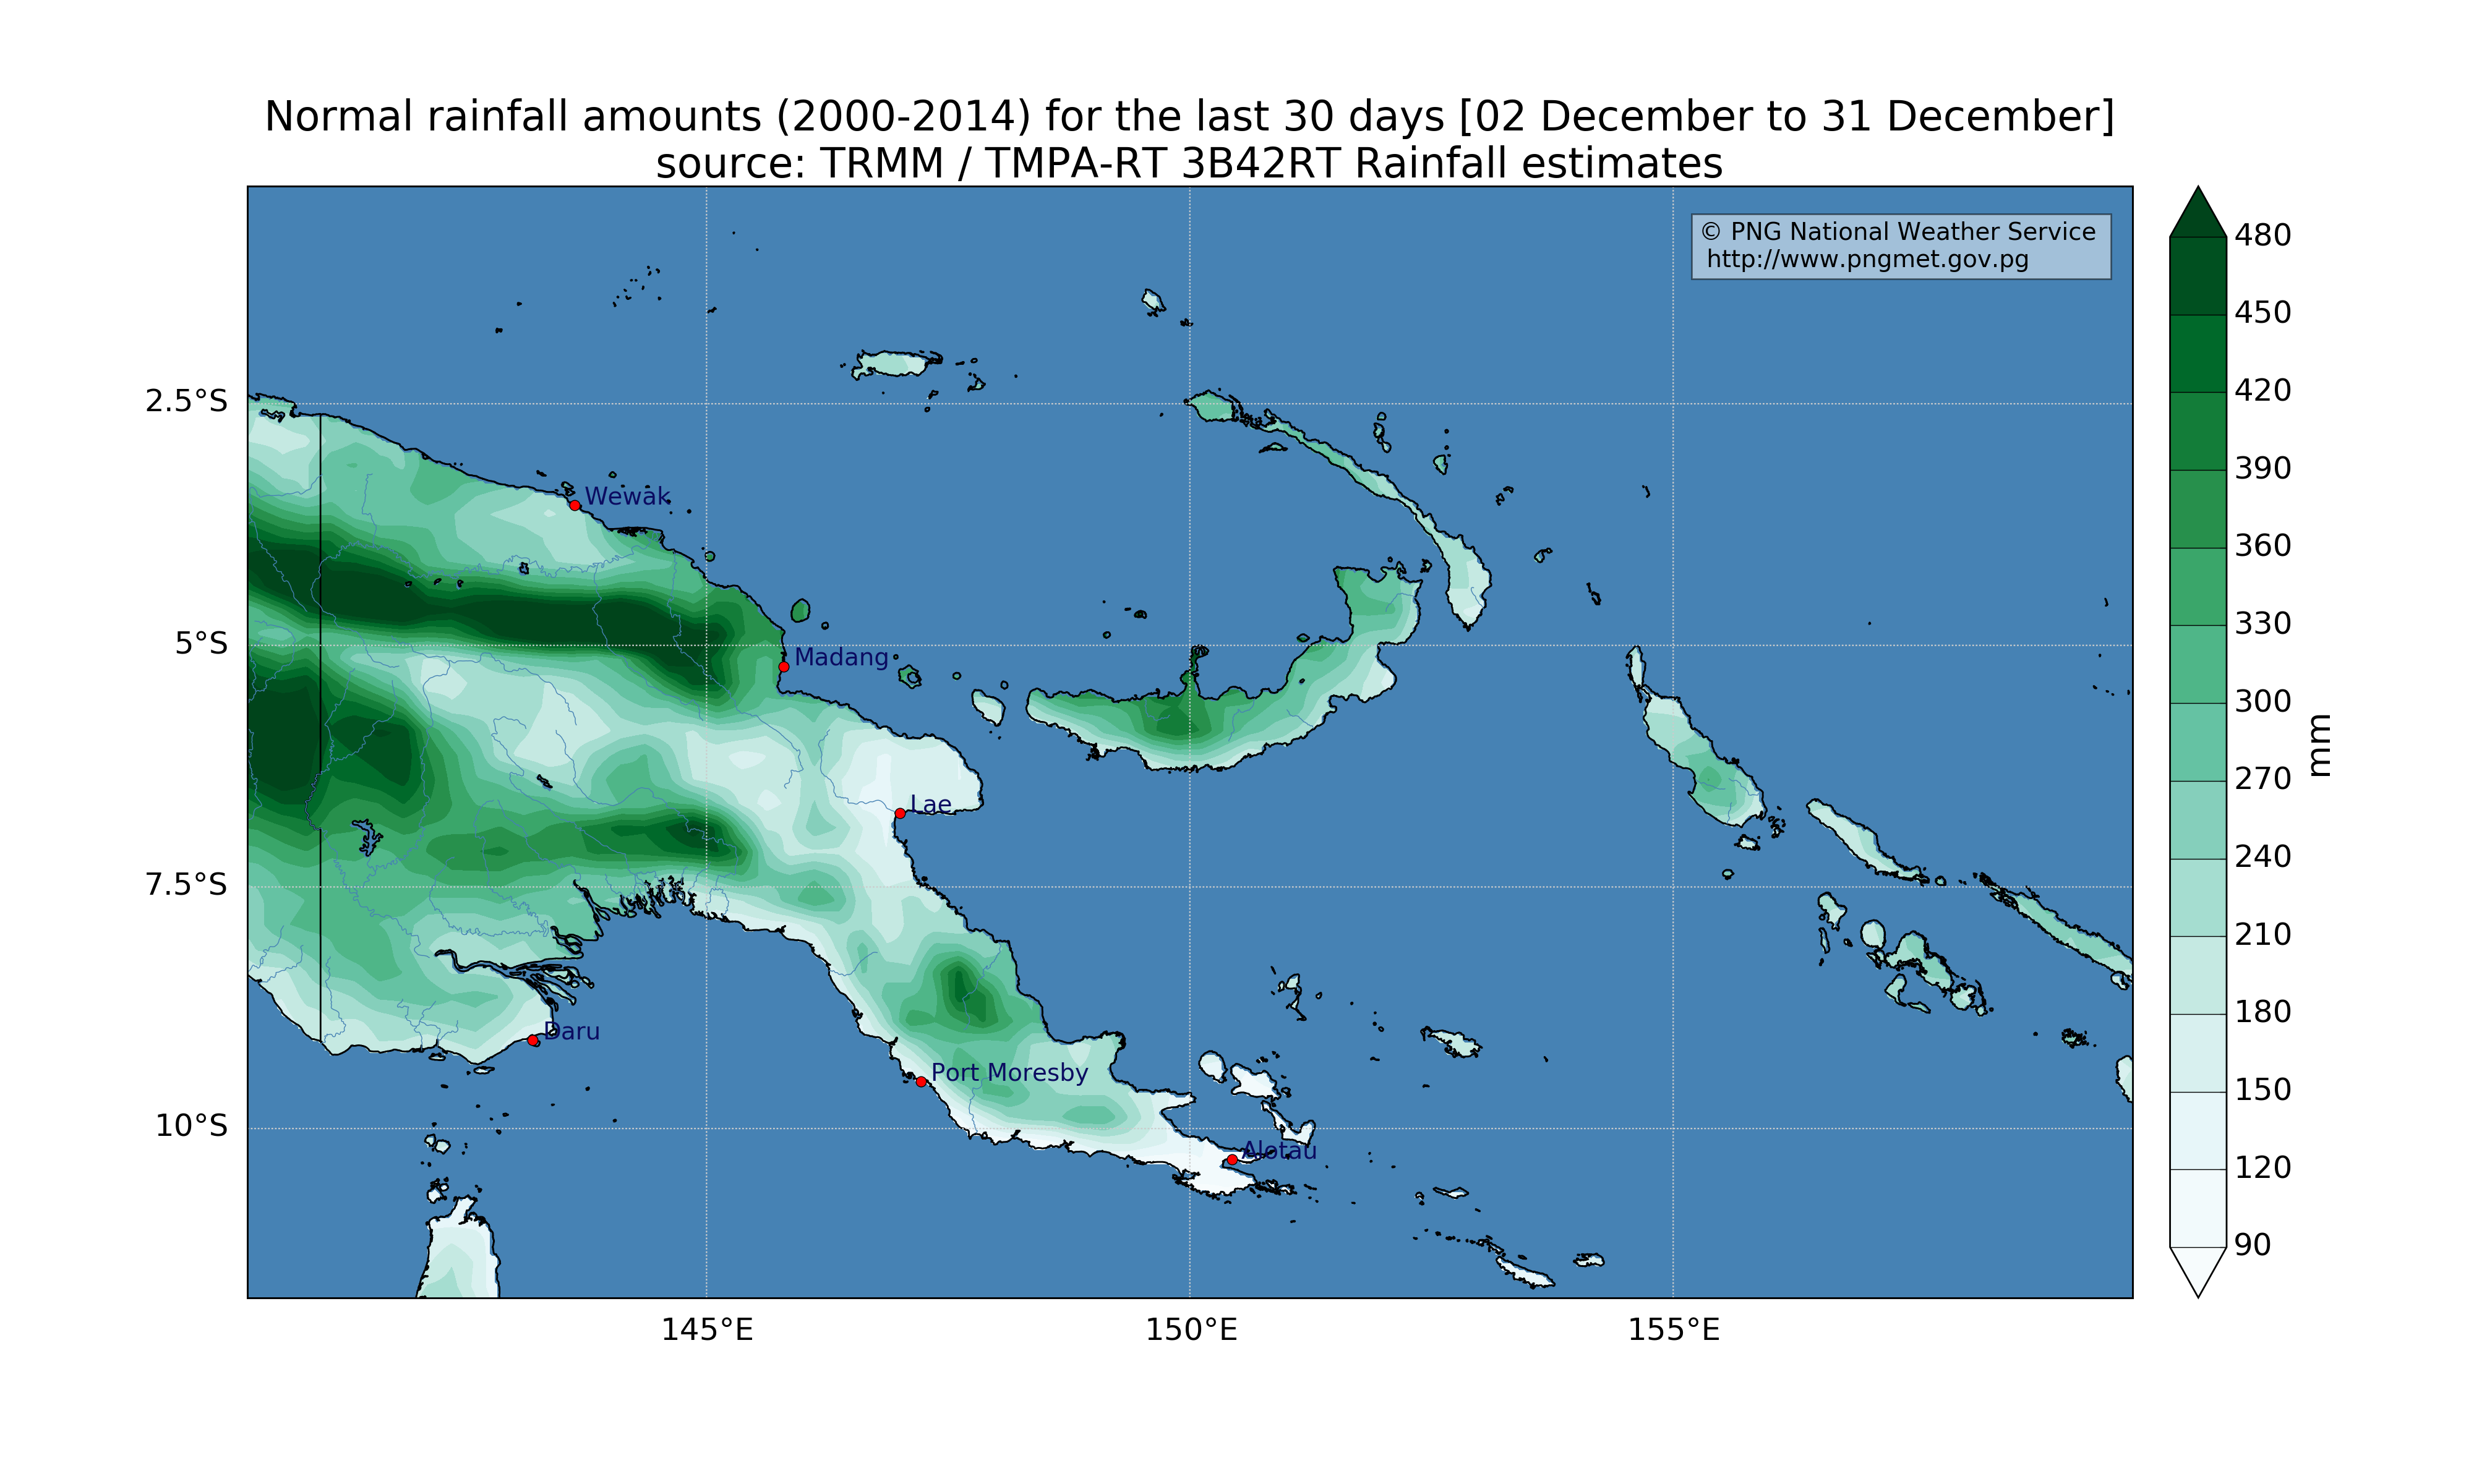 climatology (2000 - 2014 average) for the last 30 days